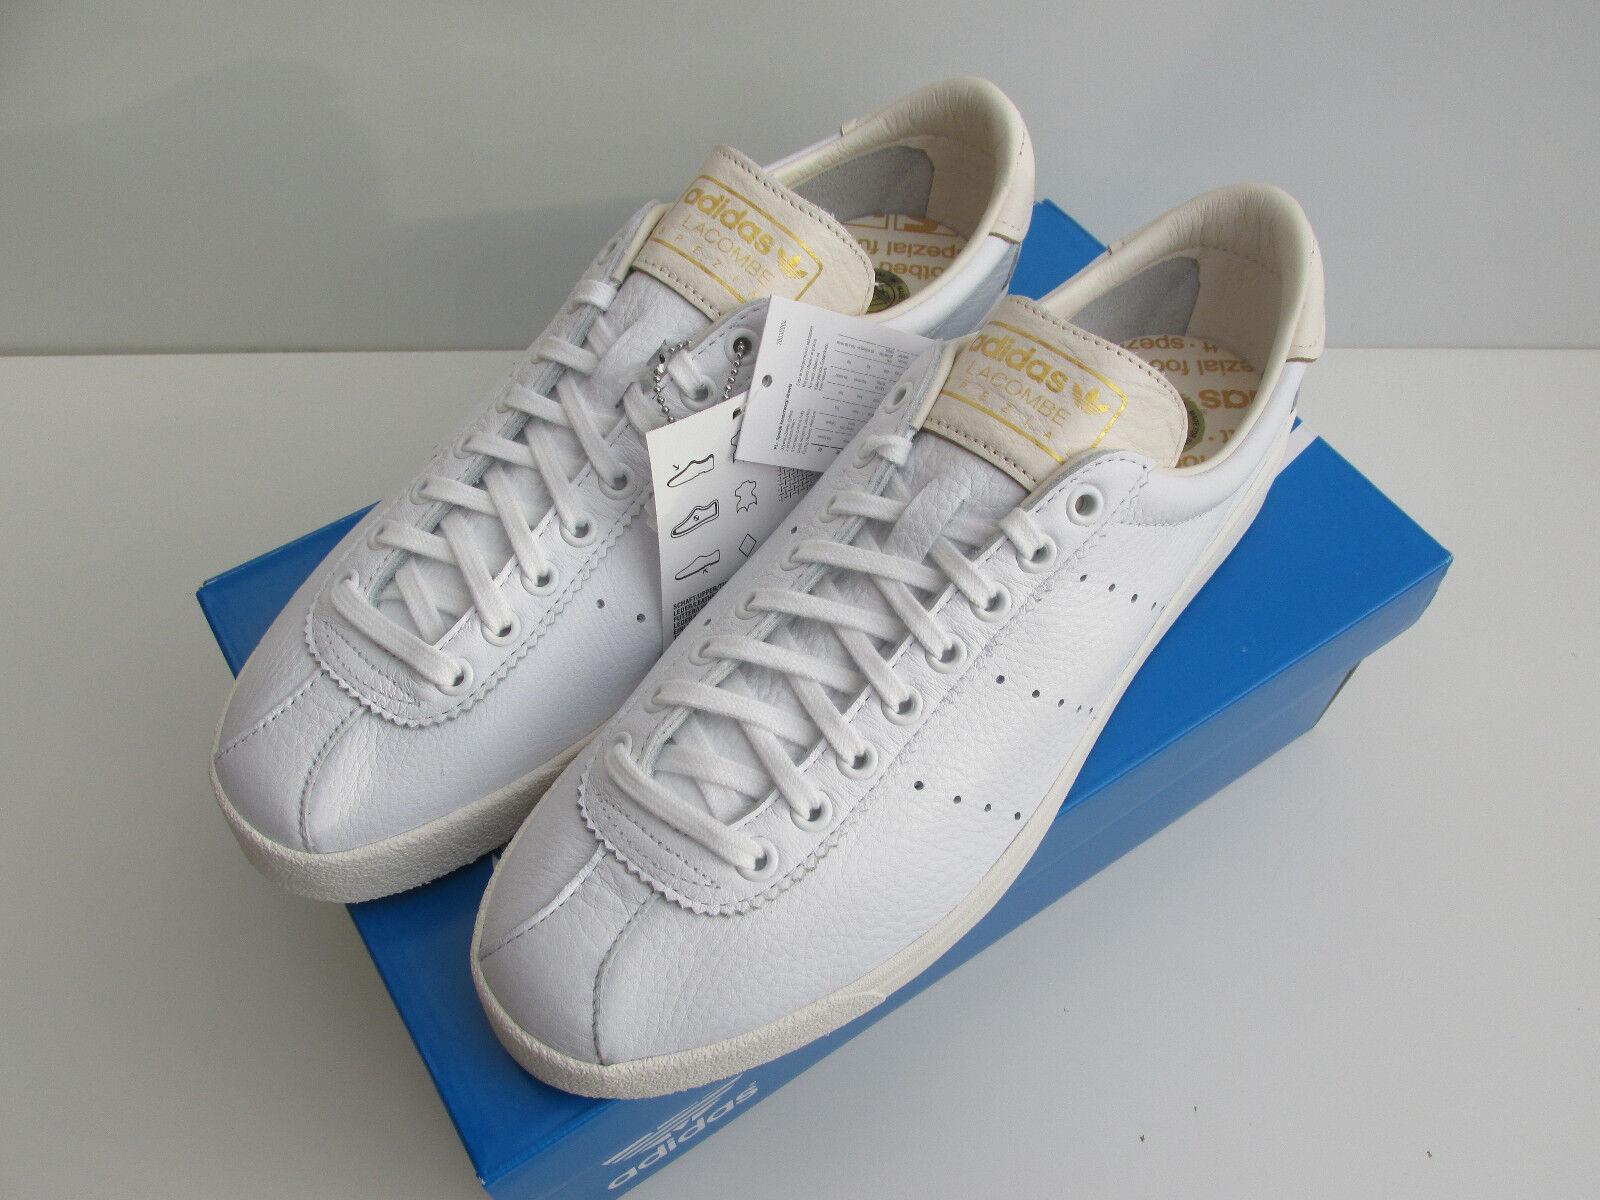 Bnib ADIDAS SPZL Lacombe UK 9.5 Weiß Weiß Weiß & Chalk DA8786 spezial 9da7ad